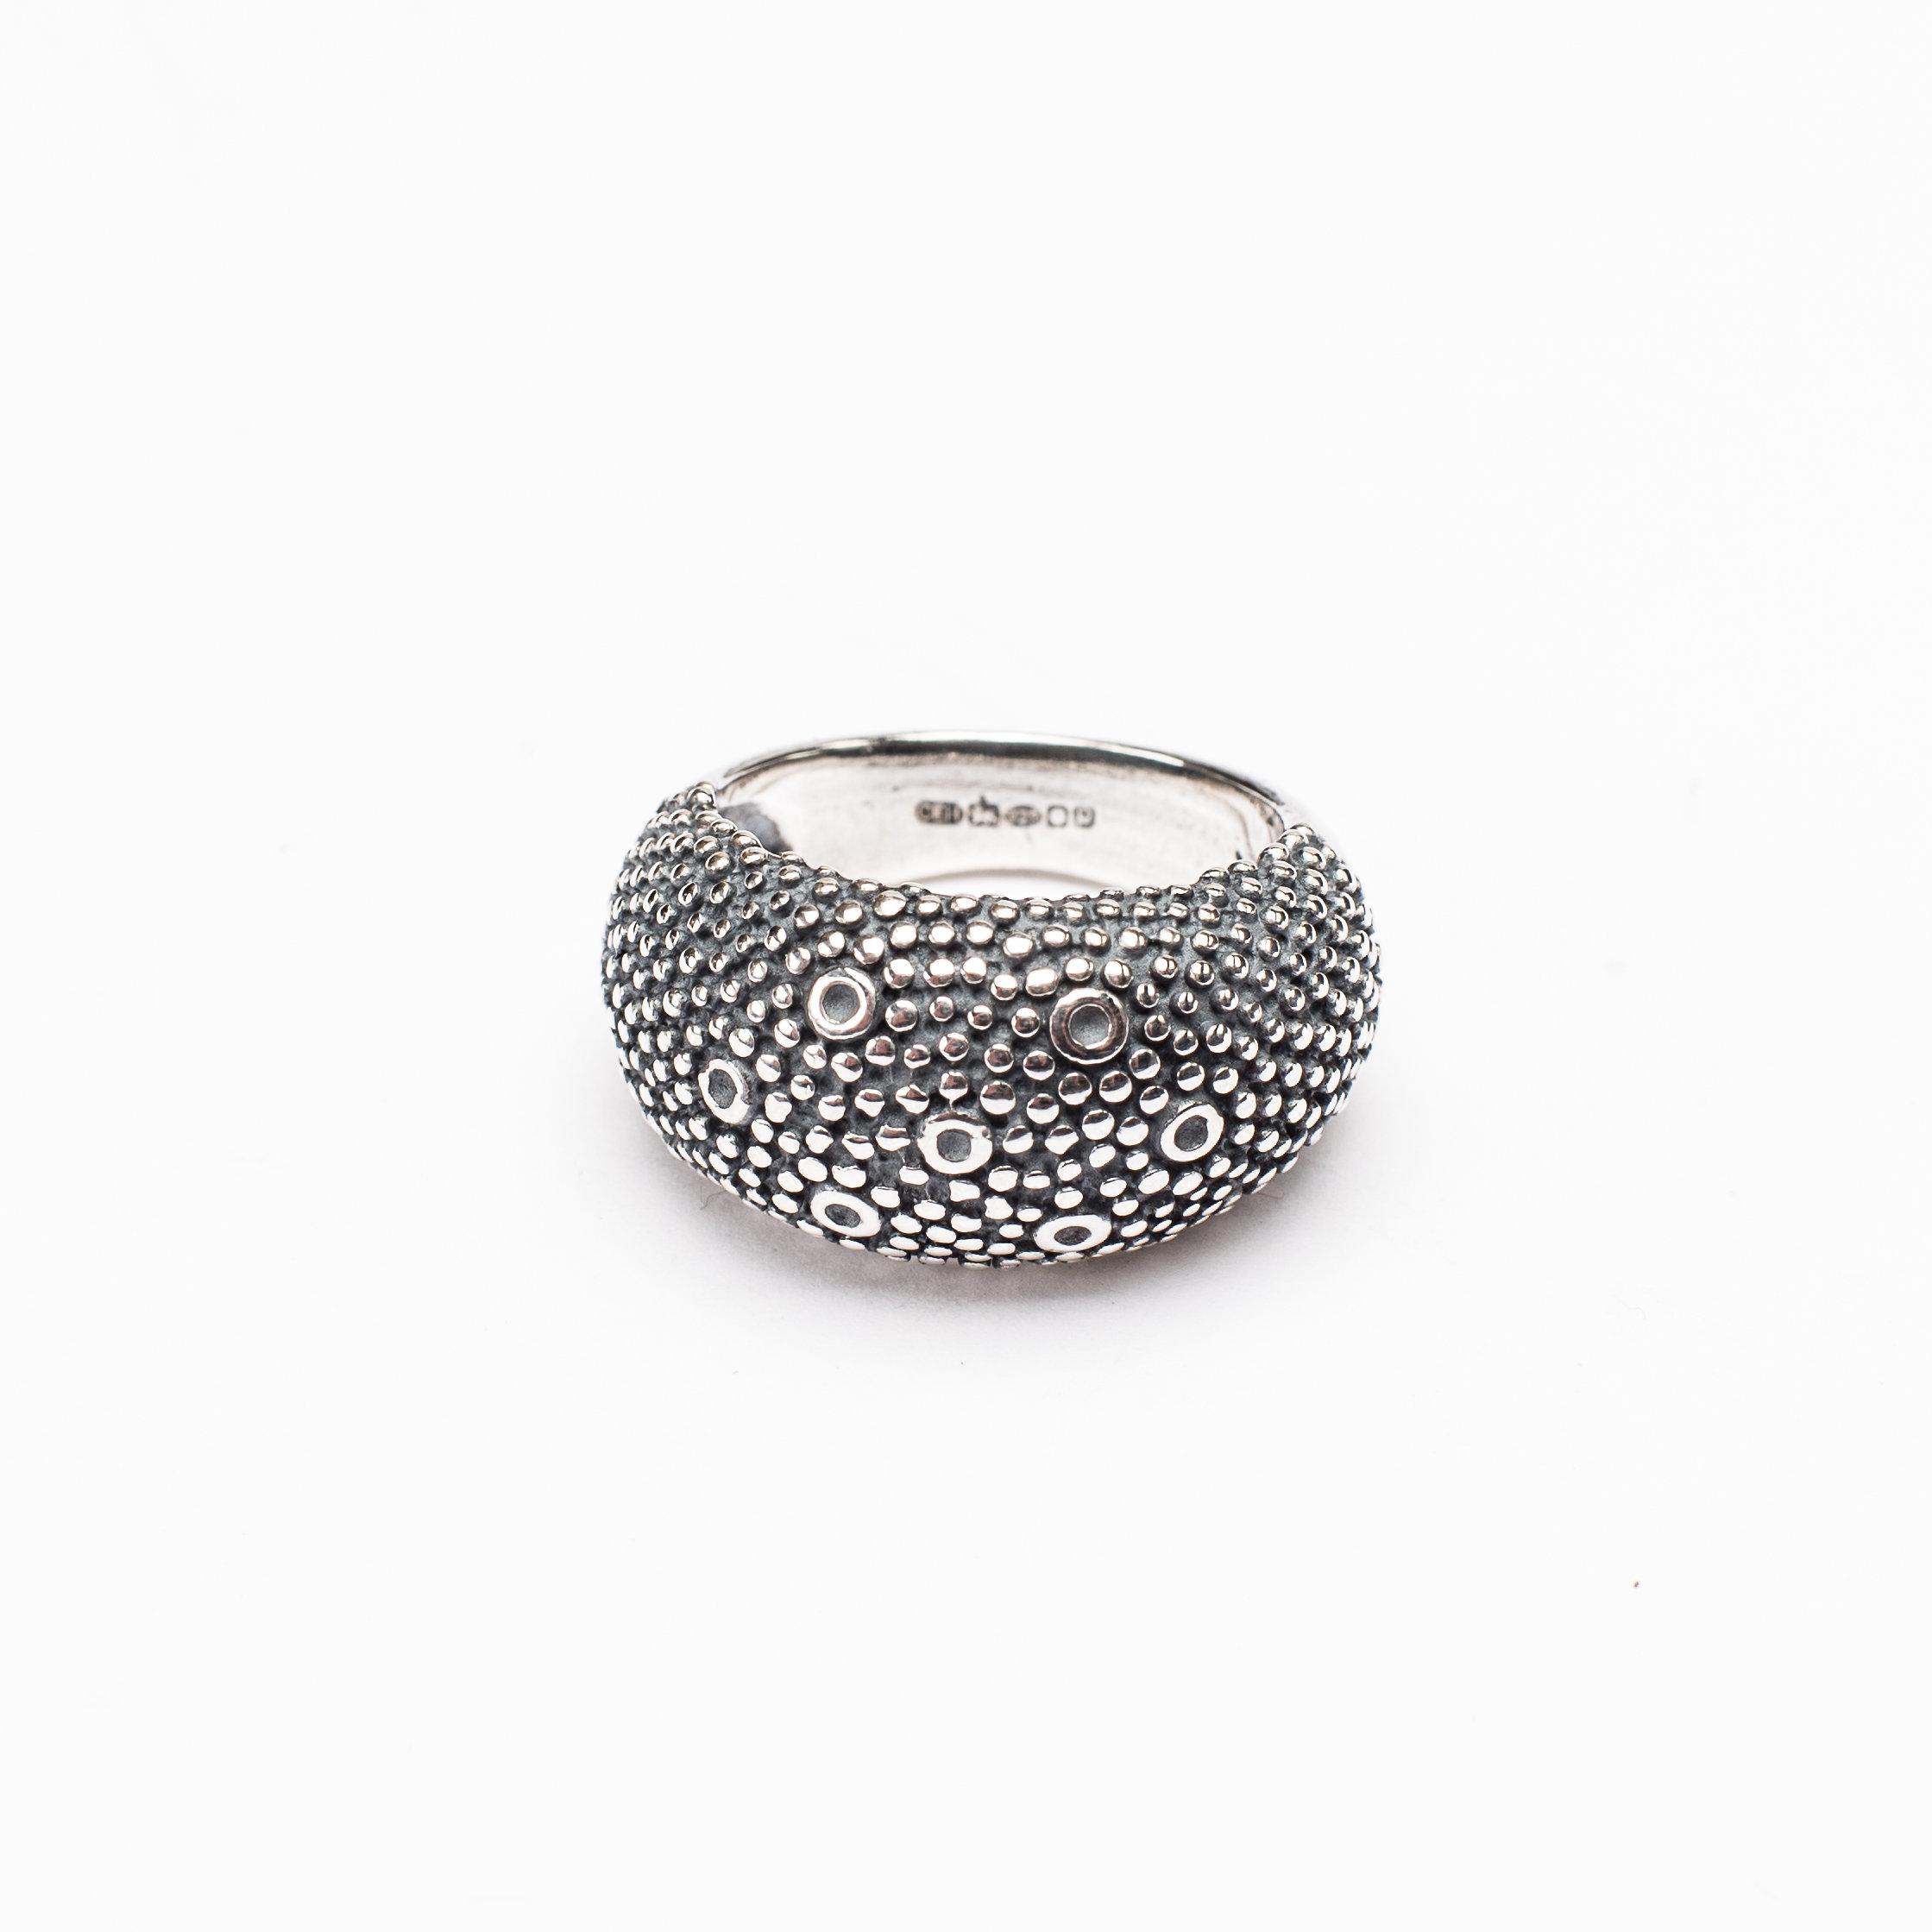 Catherine Hills Jewellery. Bubble Ring - Oxidised Silver  .jpg